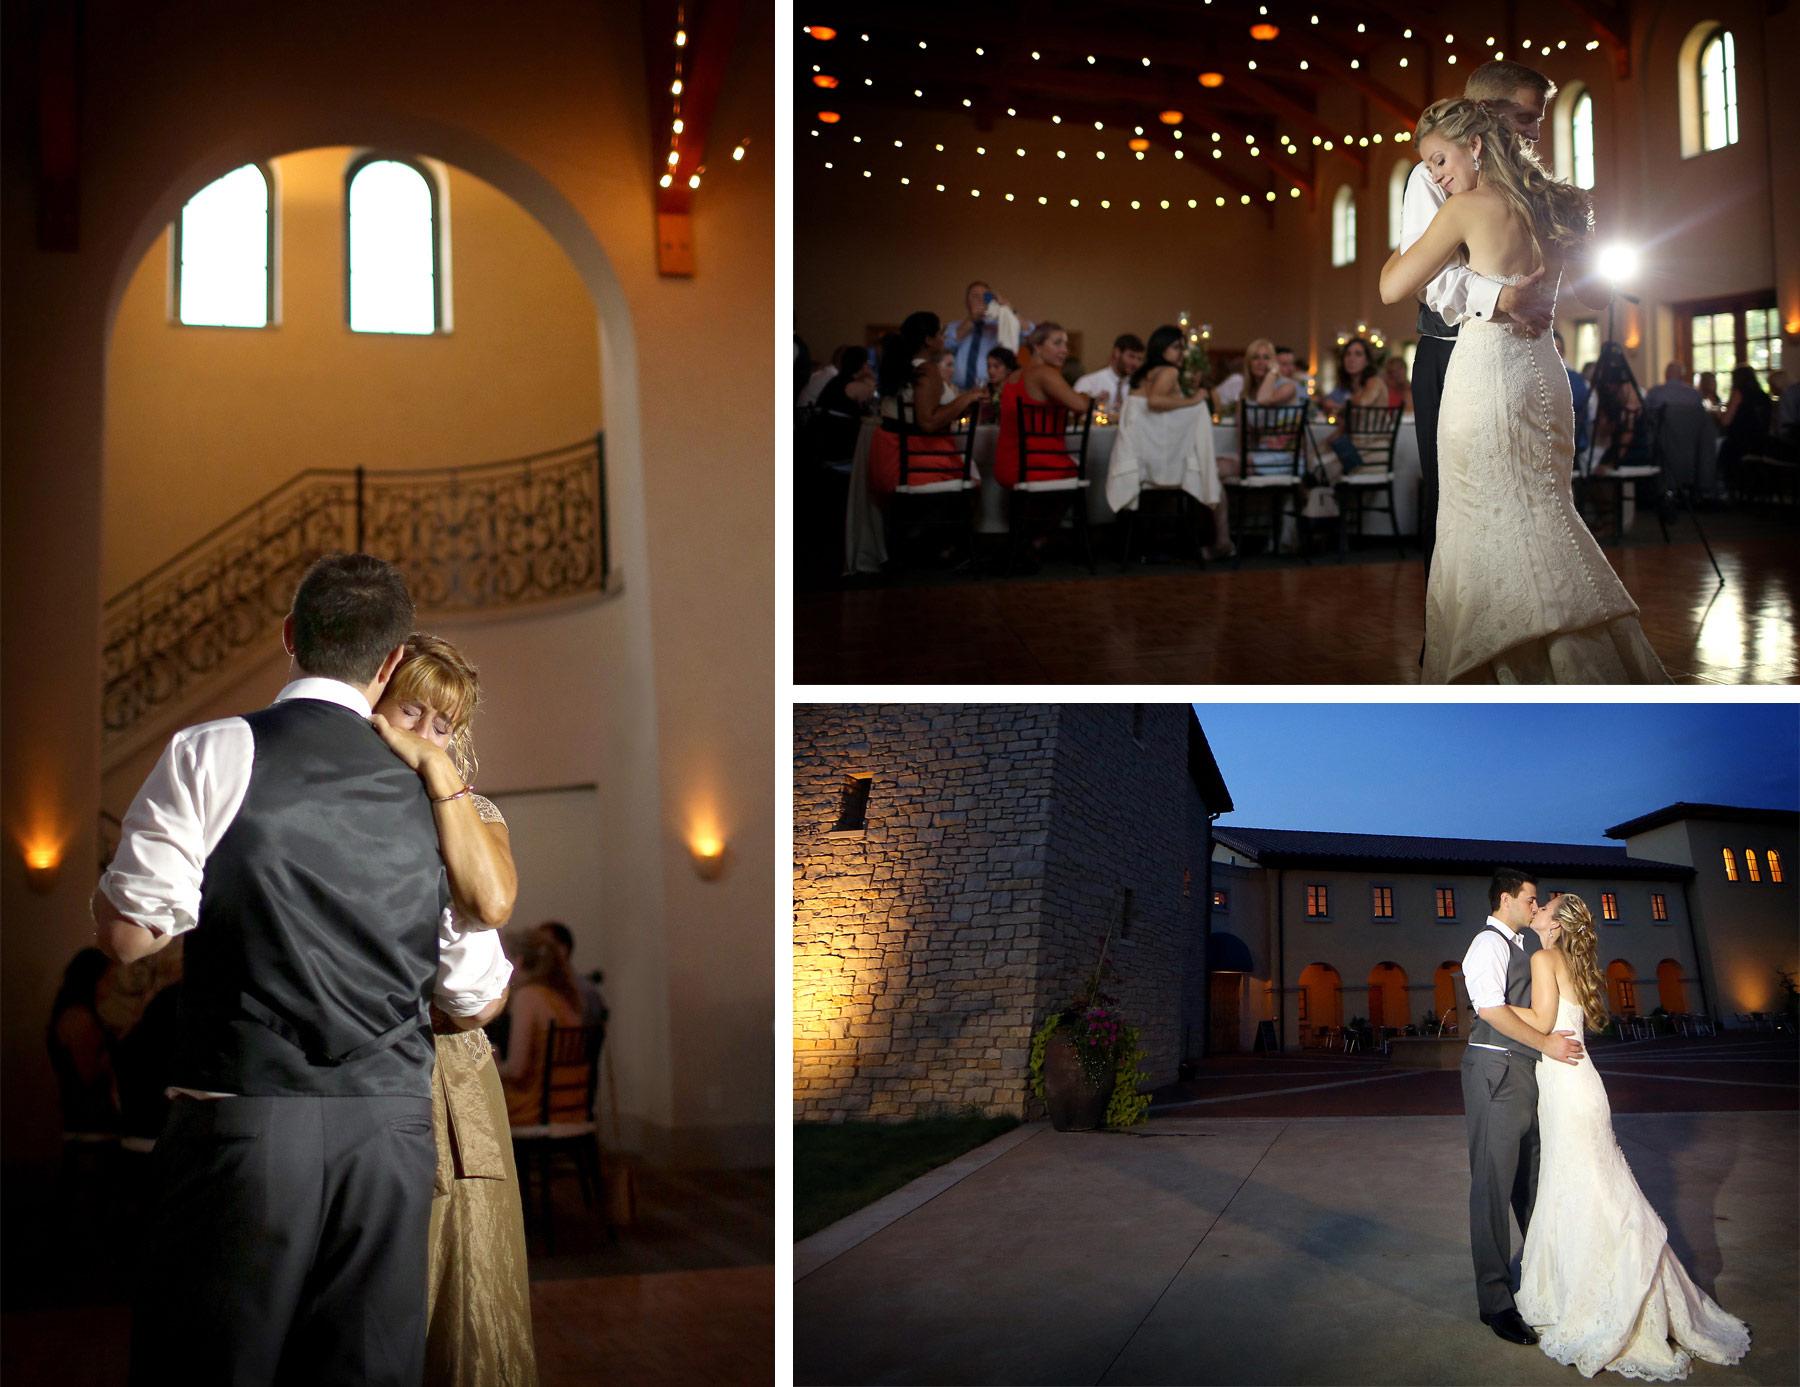 15-Lake-Pepin-Wisconsin-Wedding-Photography-by-Vick-Photography-Villa-Bellezza-Vineyard-Winery-Reception-Emily-&-Sam.jpg